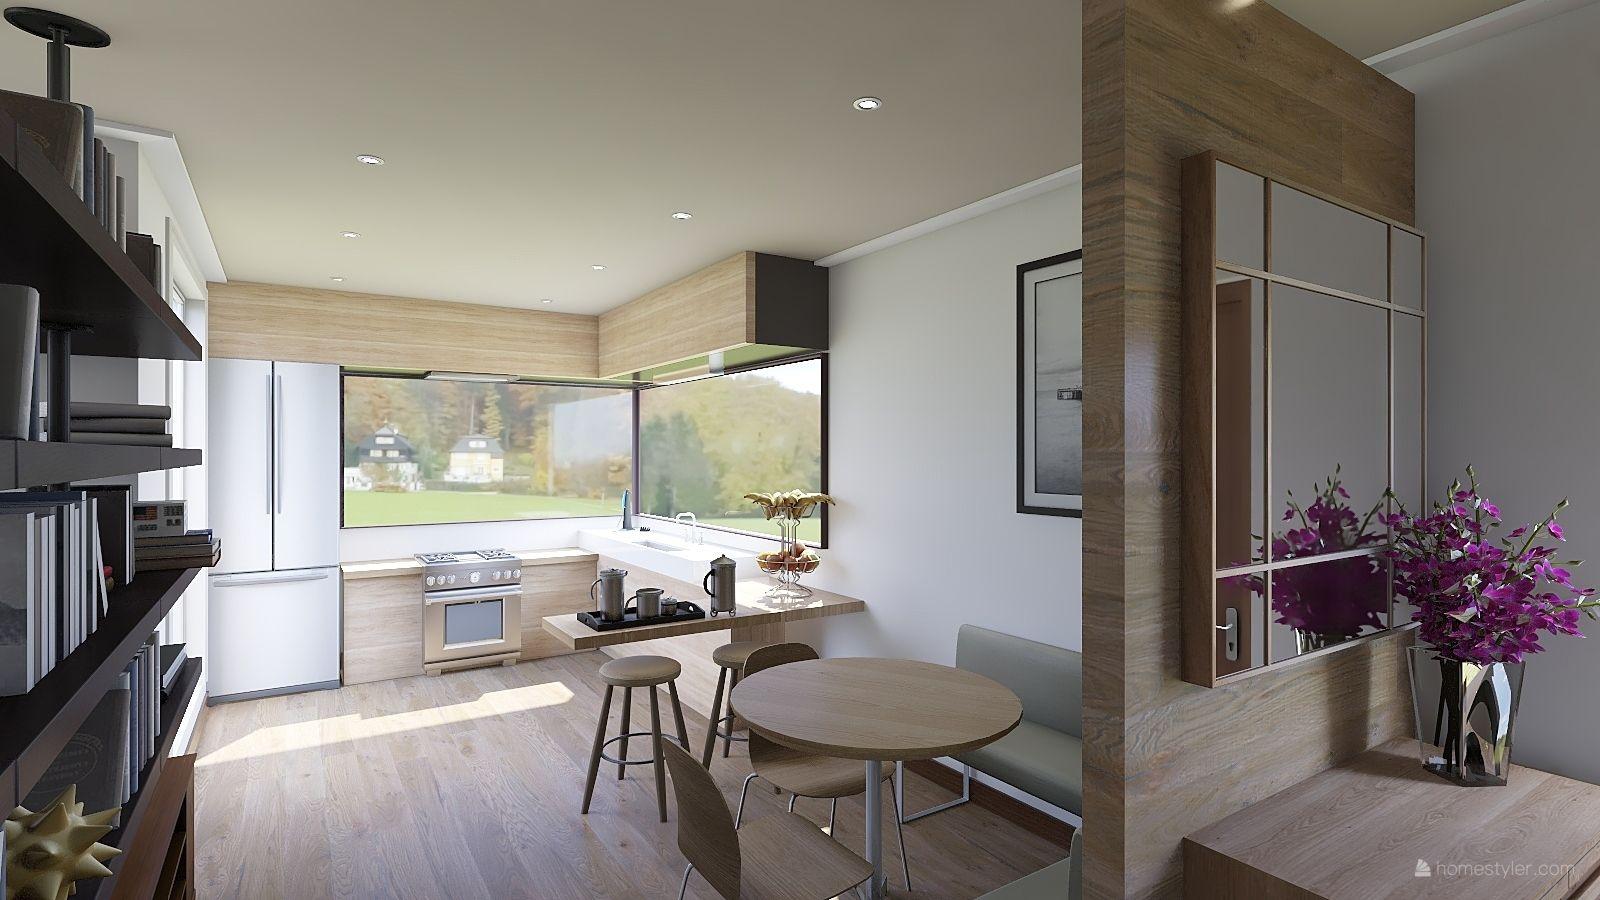 Dining Room Design By Noah Camilleri Interiordesign Dining